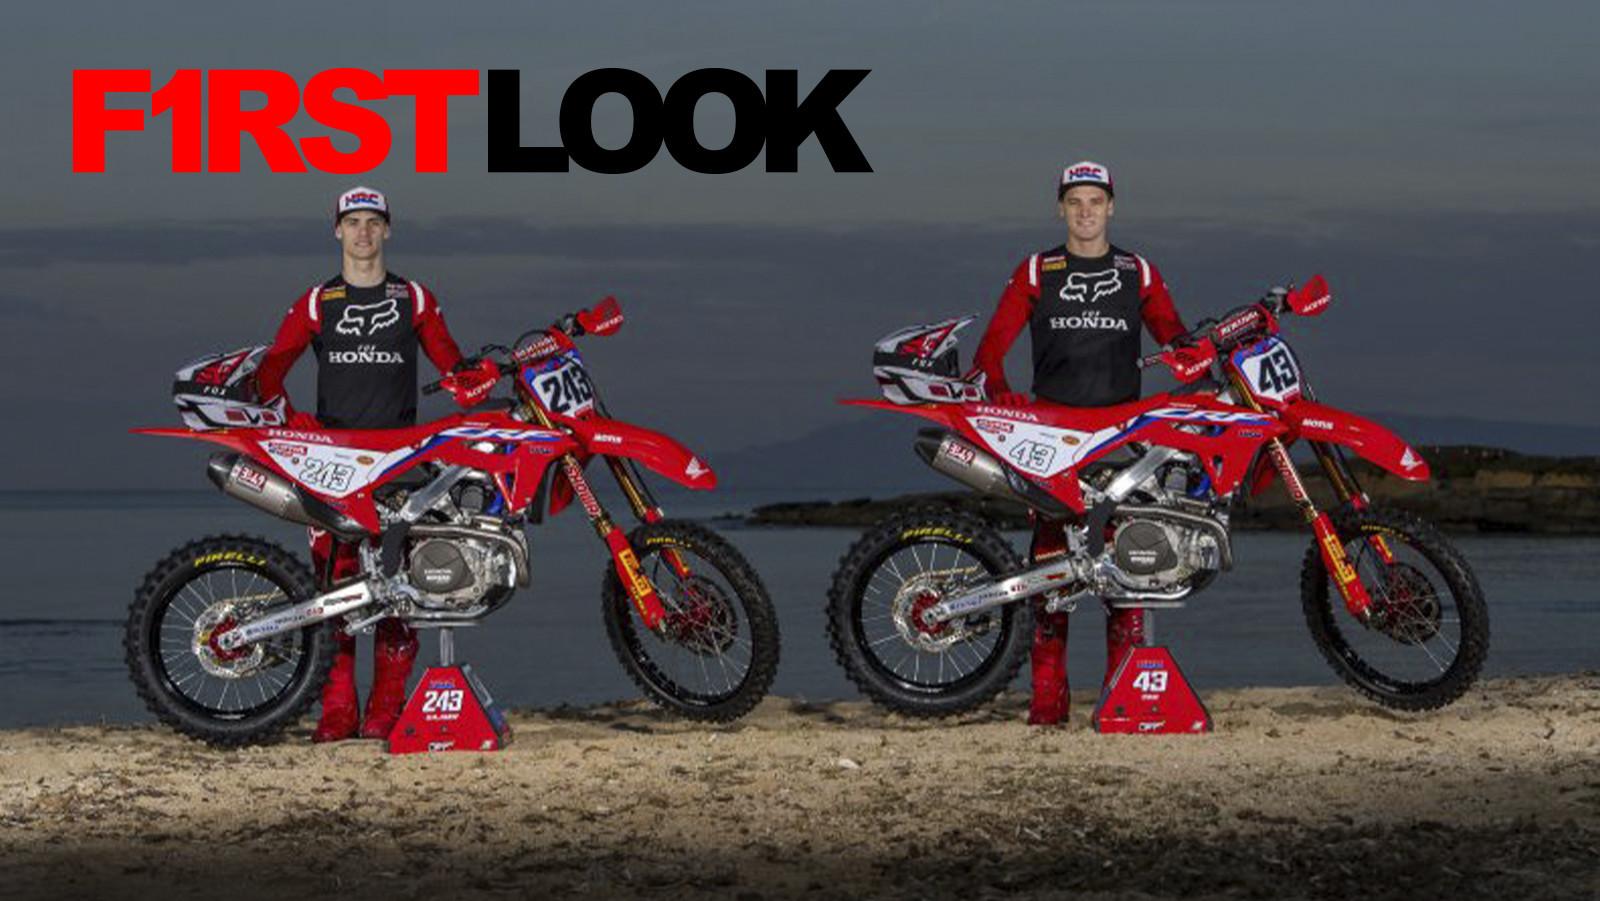 First Look: Honda HRC MXGP Team On Possible 2021 Honda CRF450RW